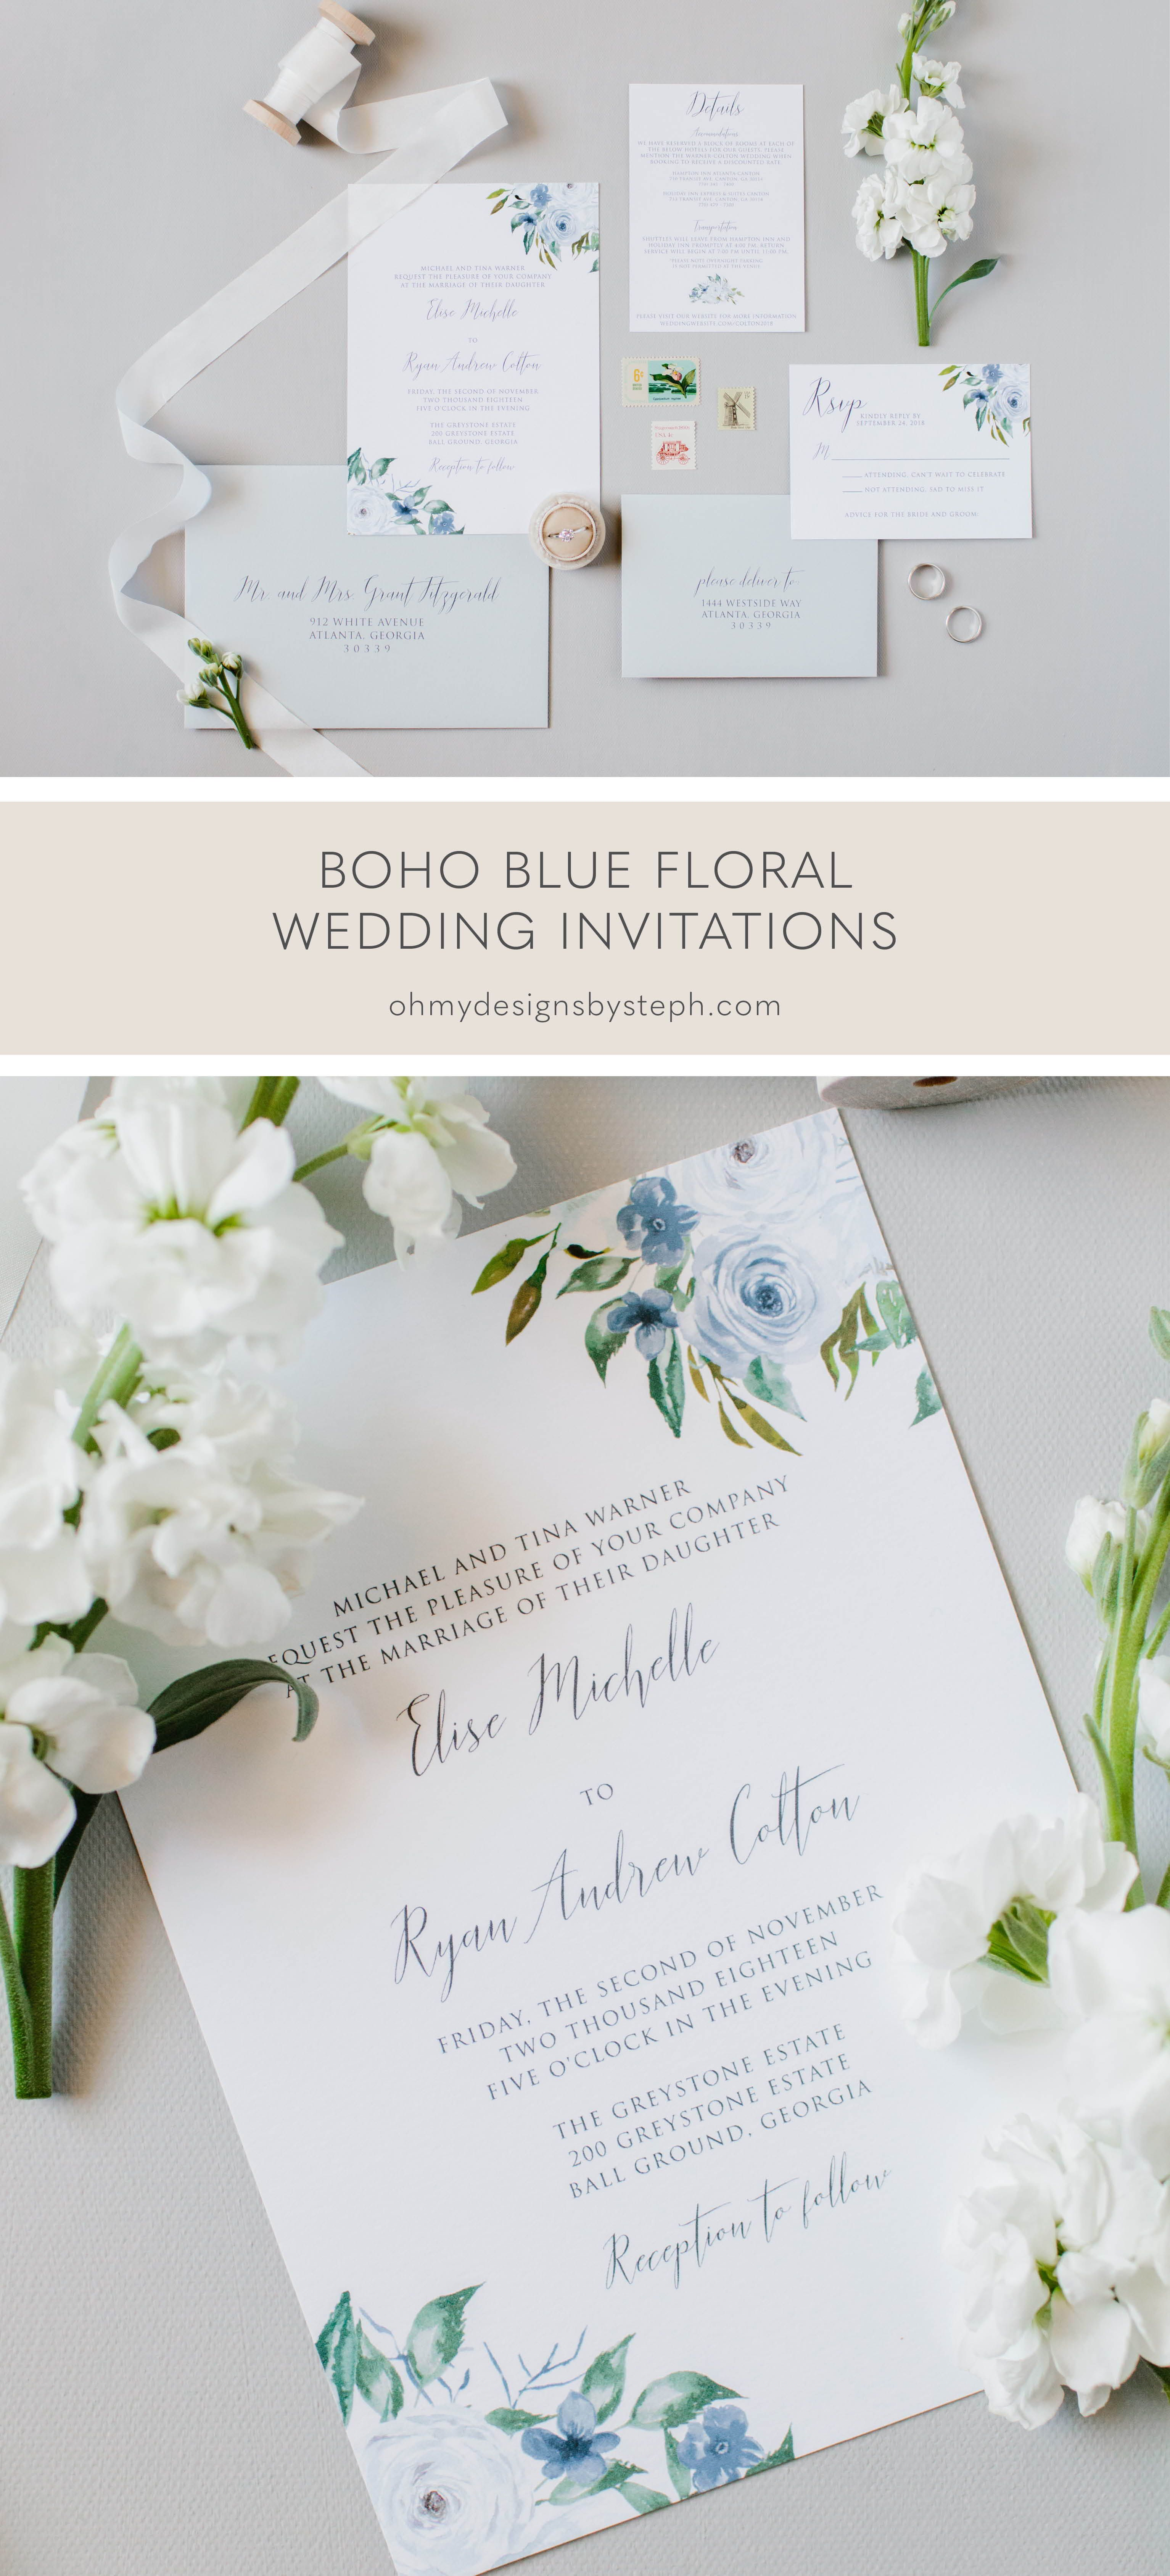 Dusty Blue Floral Wedding Invitation Sample Oh My Designs By Steph In 2020 Wedding Invitations Boho Floral Wedding Invitations Wedding Invitations